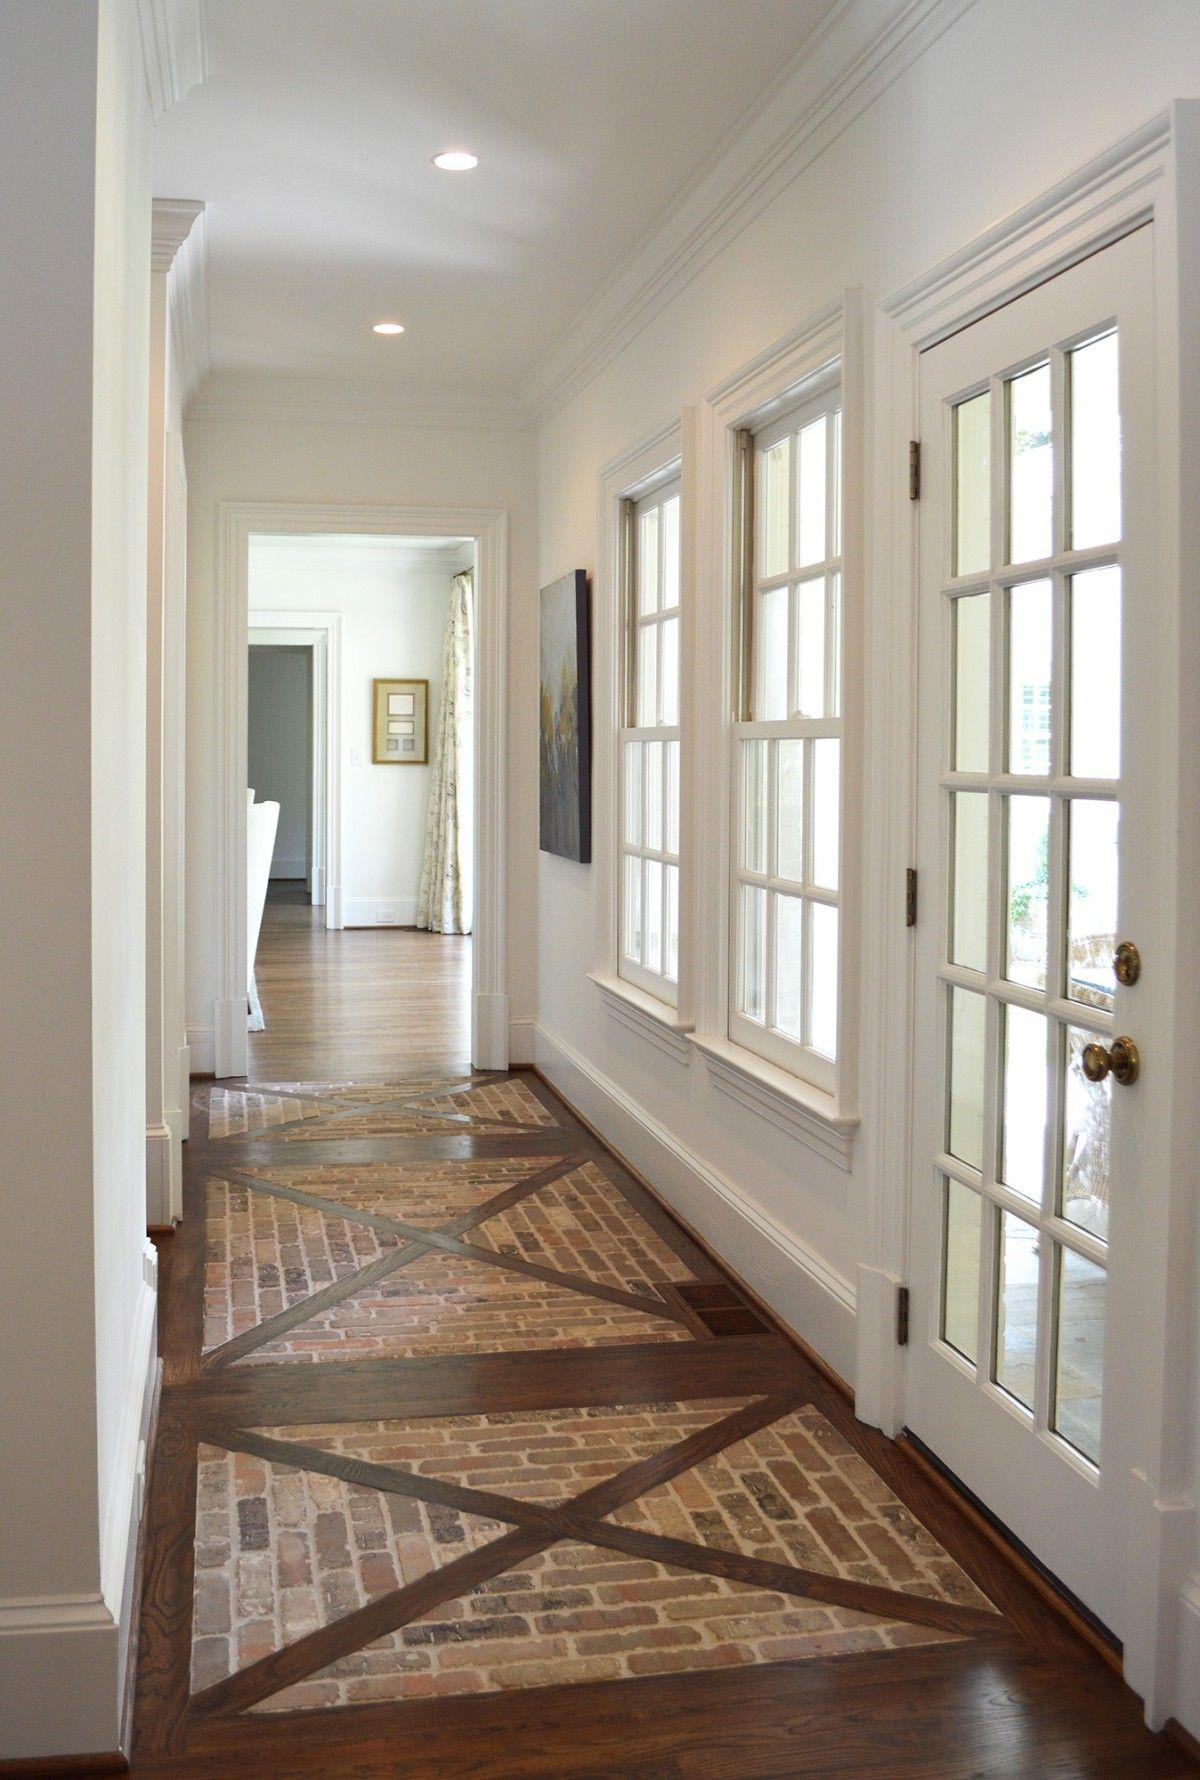 Brick And Wood Floor Home Brick Flooring Home Decor